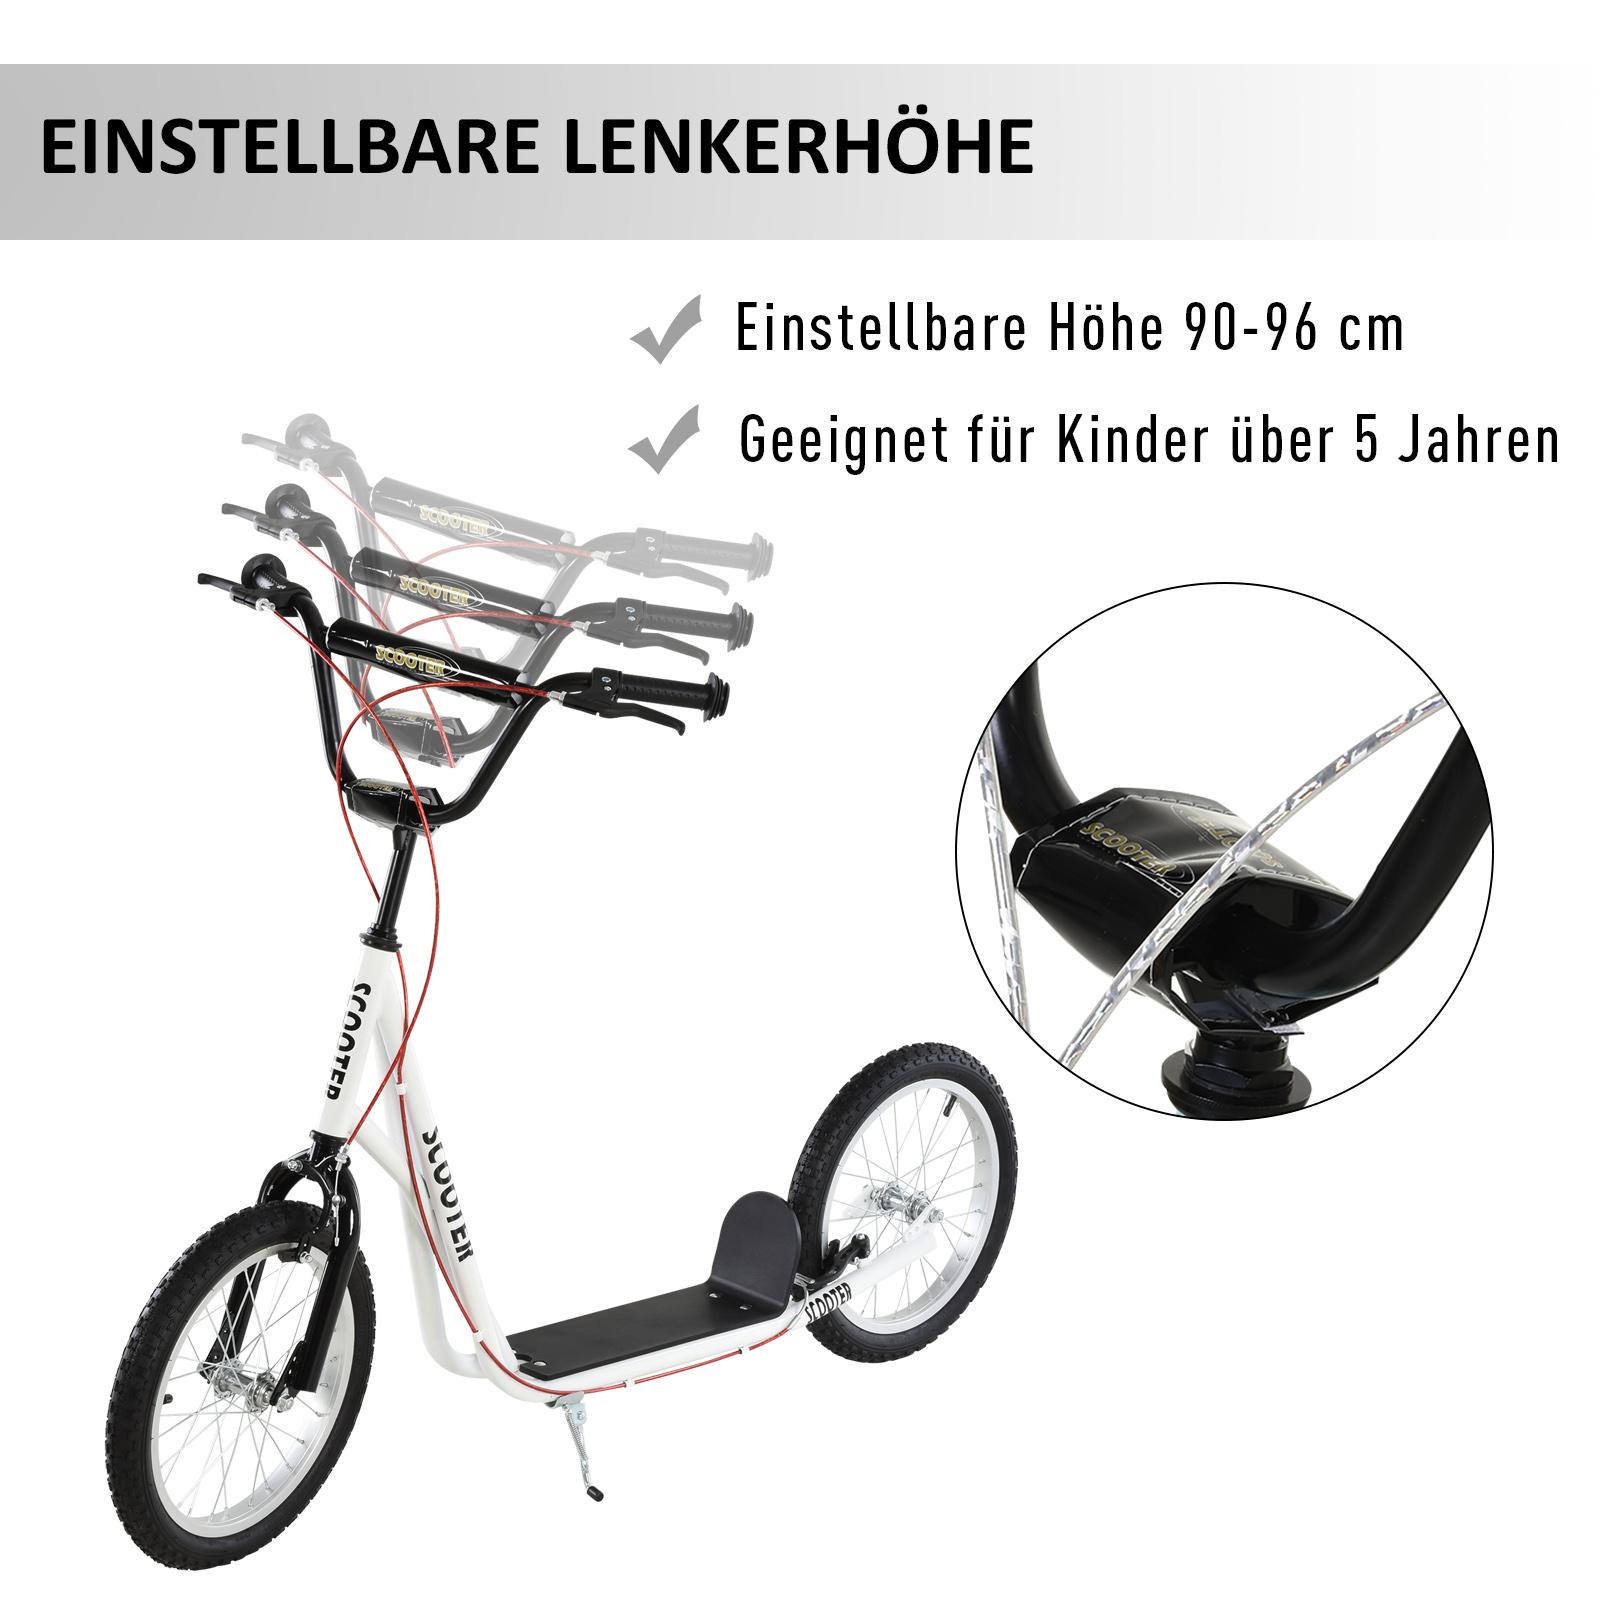 Indexbild 42 - HOMCOM-Tretroller-Kinderroller-Scooter-Cityroller-Roller-verstellbar-Blau-Gruen